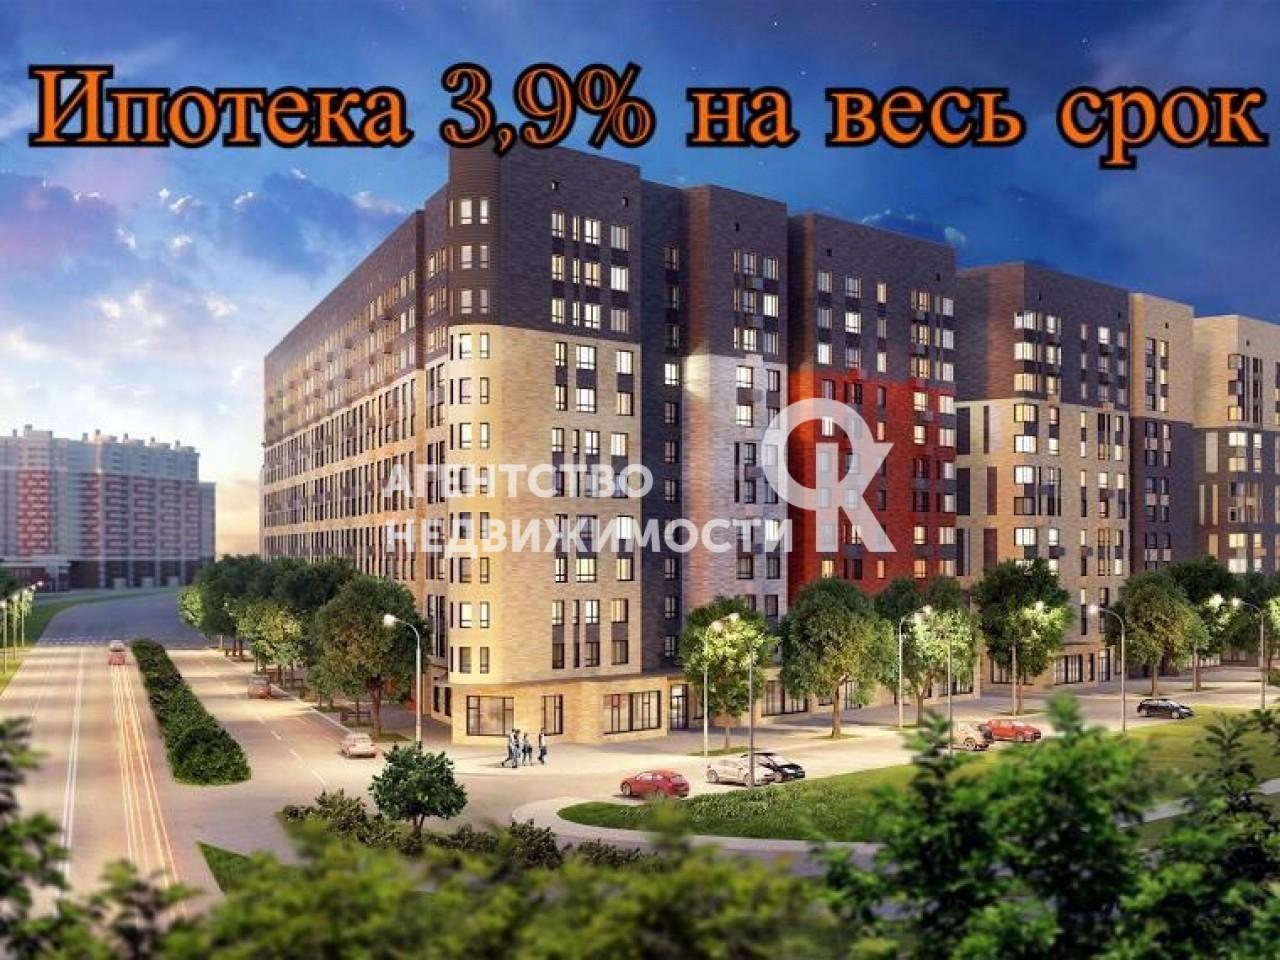 Продажа 3-к квартиры ул. Баки Урманче, д. 15-16, корп. 3